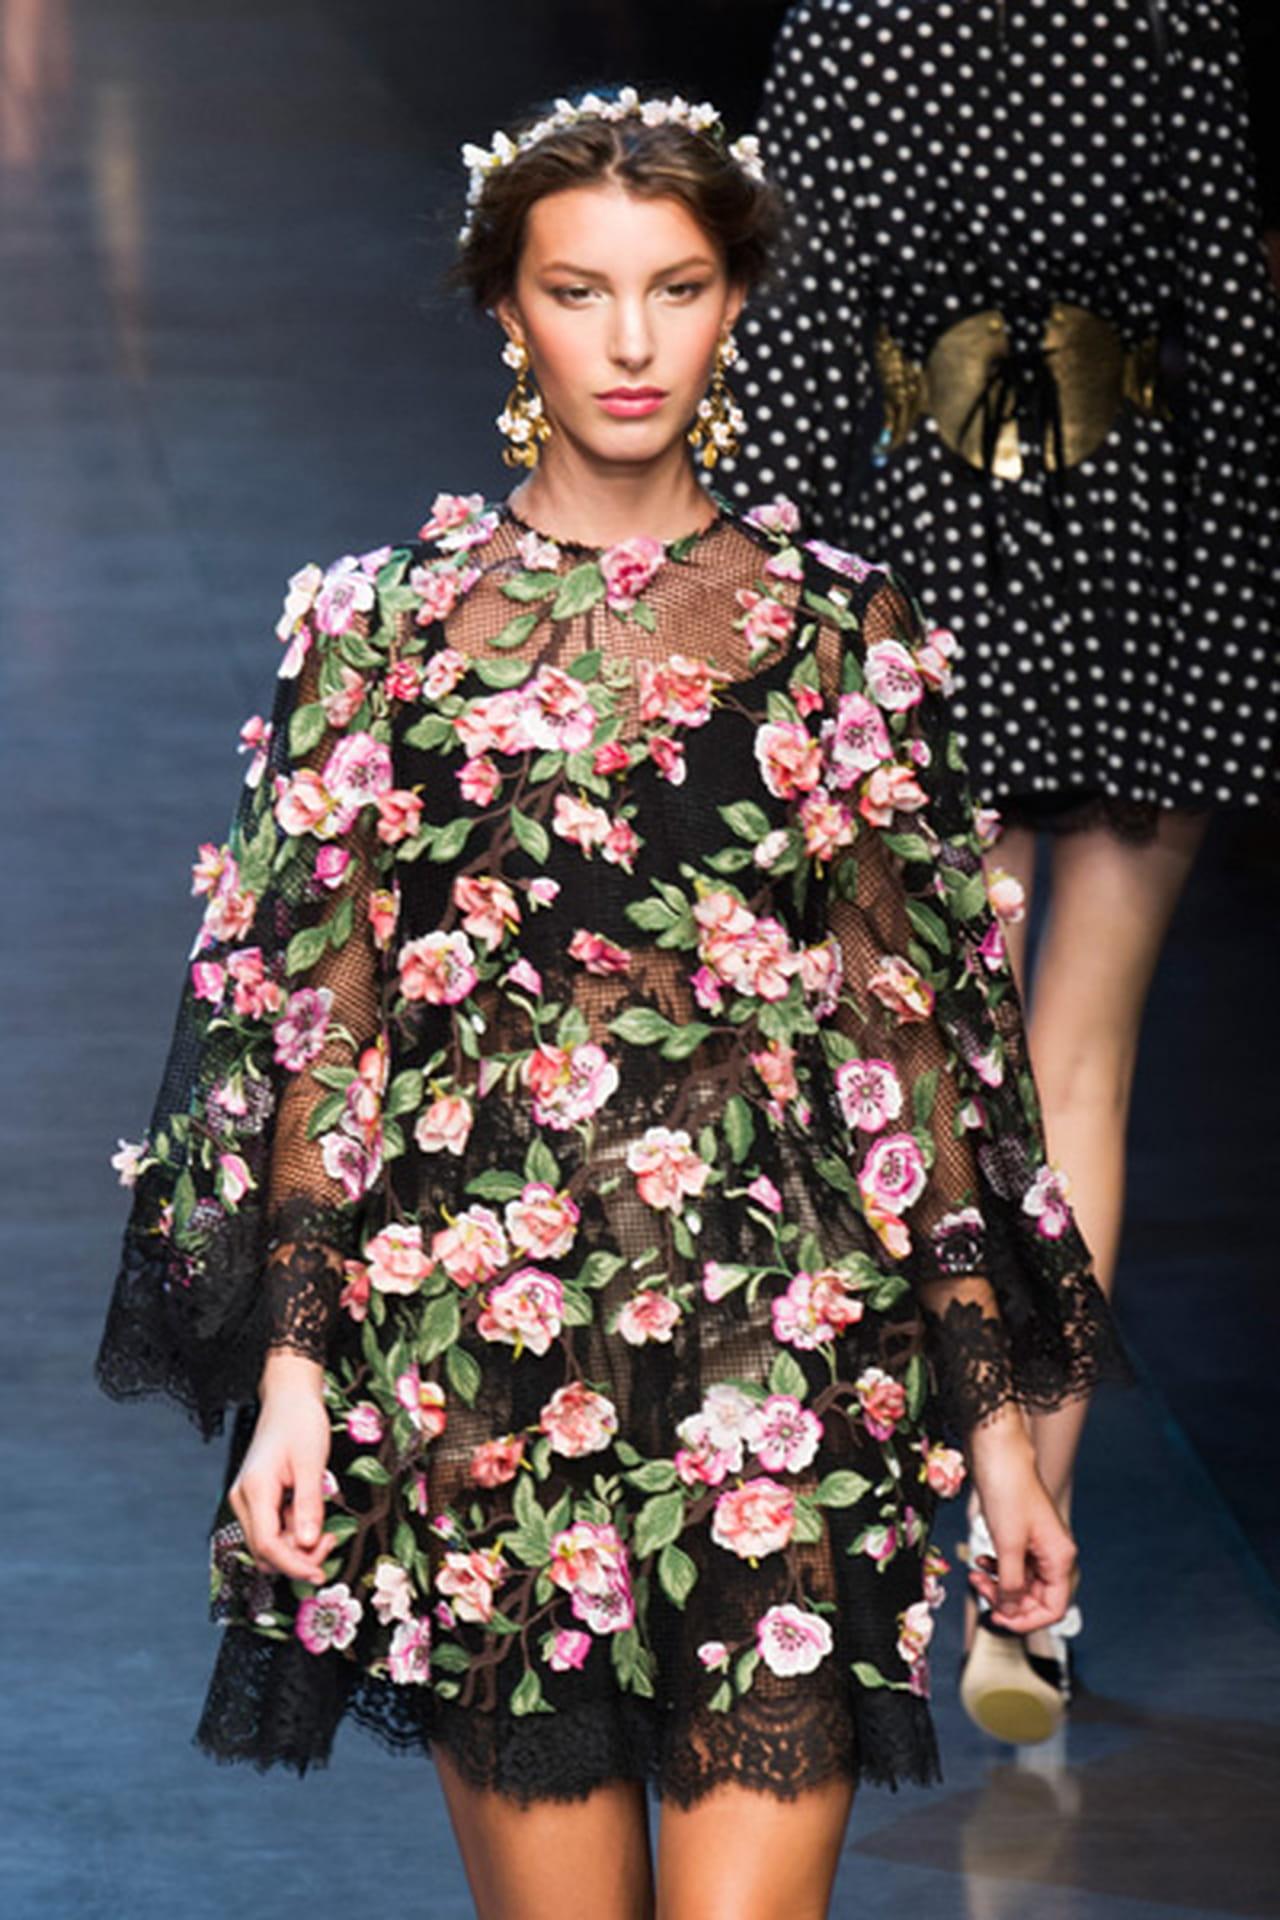 bdaa47f81 جولة على أجمل تصاميم أسبوع الموضة في ميلانو لربيع وصيف 2014